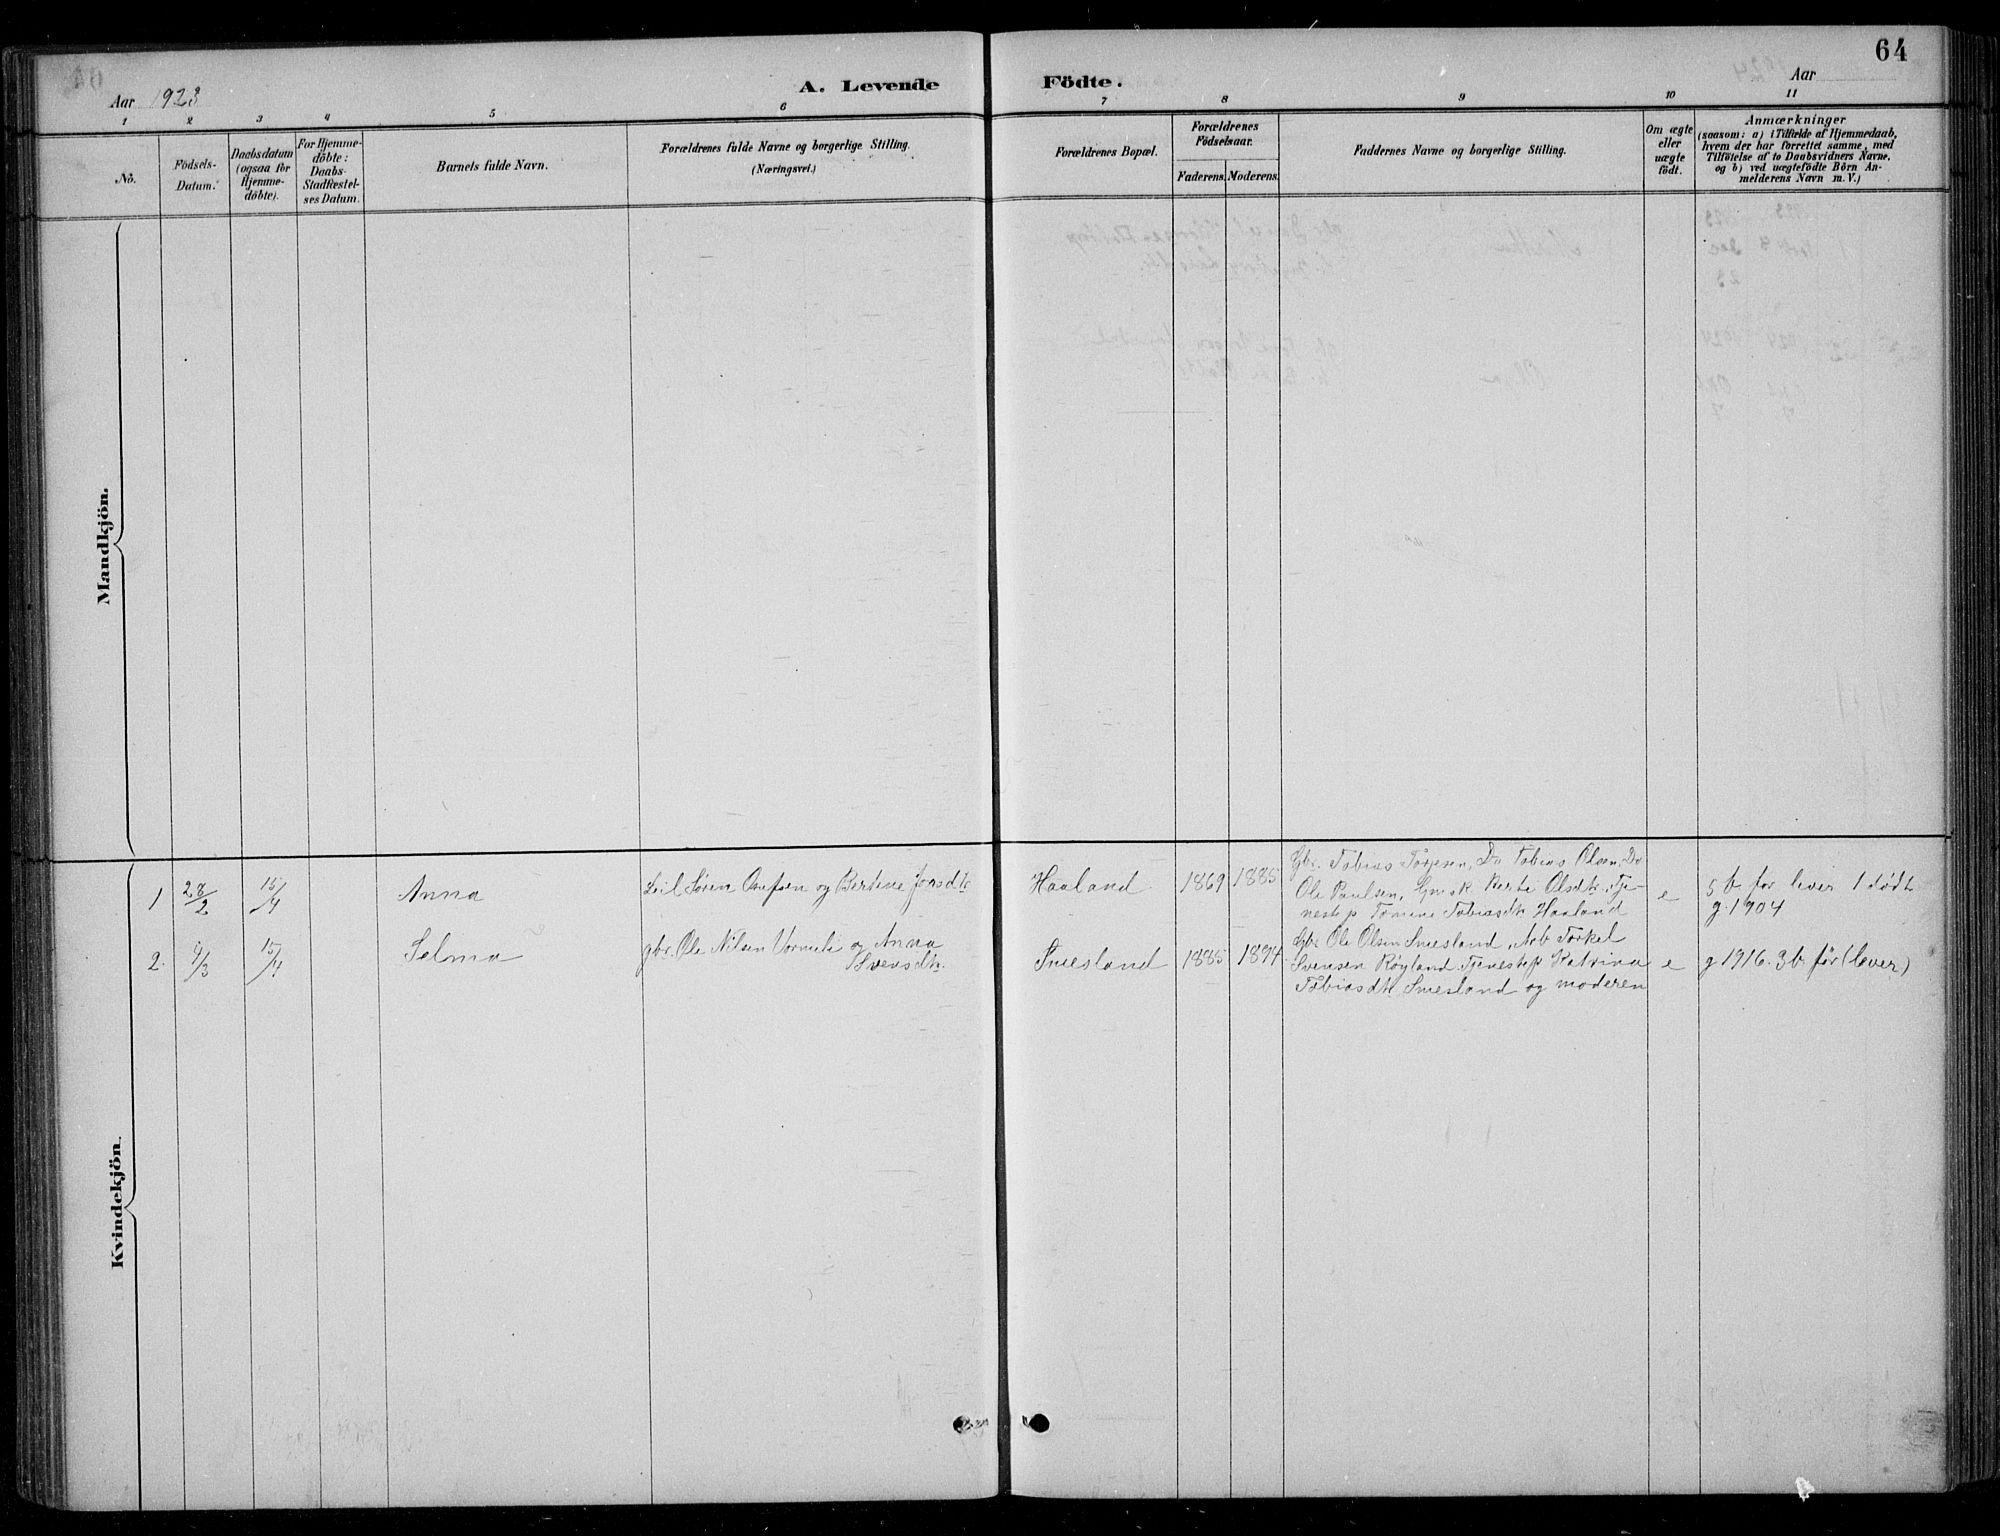 SAK, Bjelland sokneprestkontor, F/Fb/Fbc/L0003: Klokkerbok nr. B 3, 1887-1924, s. 64